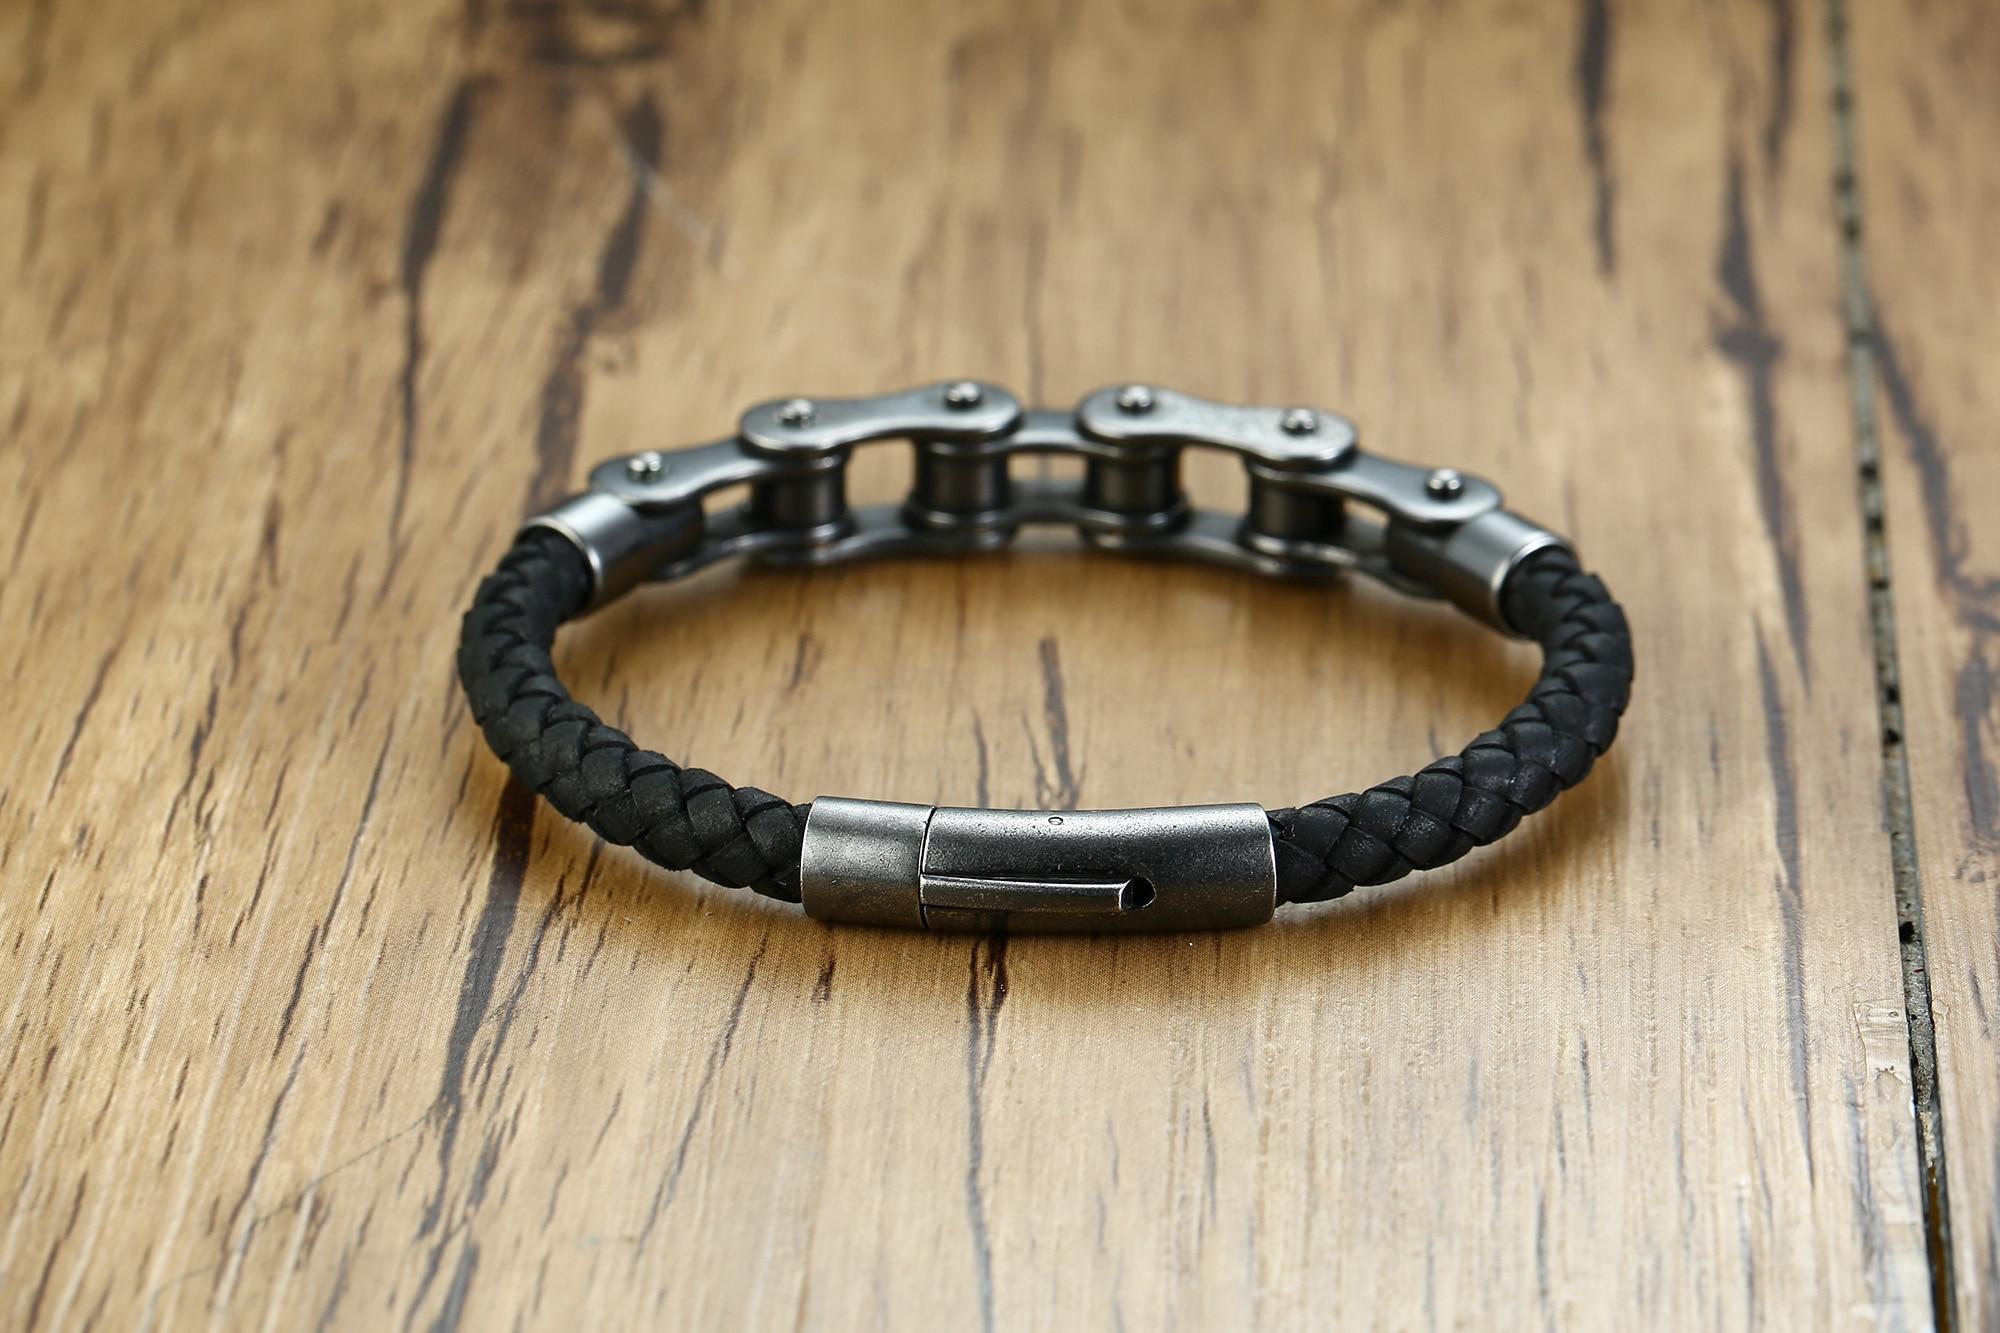 Mingao Man Bracelet Stainless Steel Bicycle Chain Leather Bracelet European and American Style Retro Black Men Braclet Friends